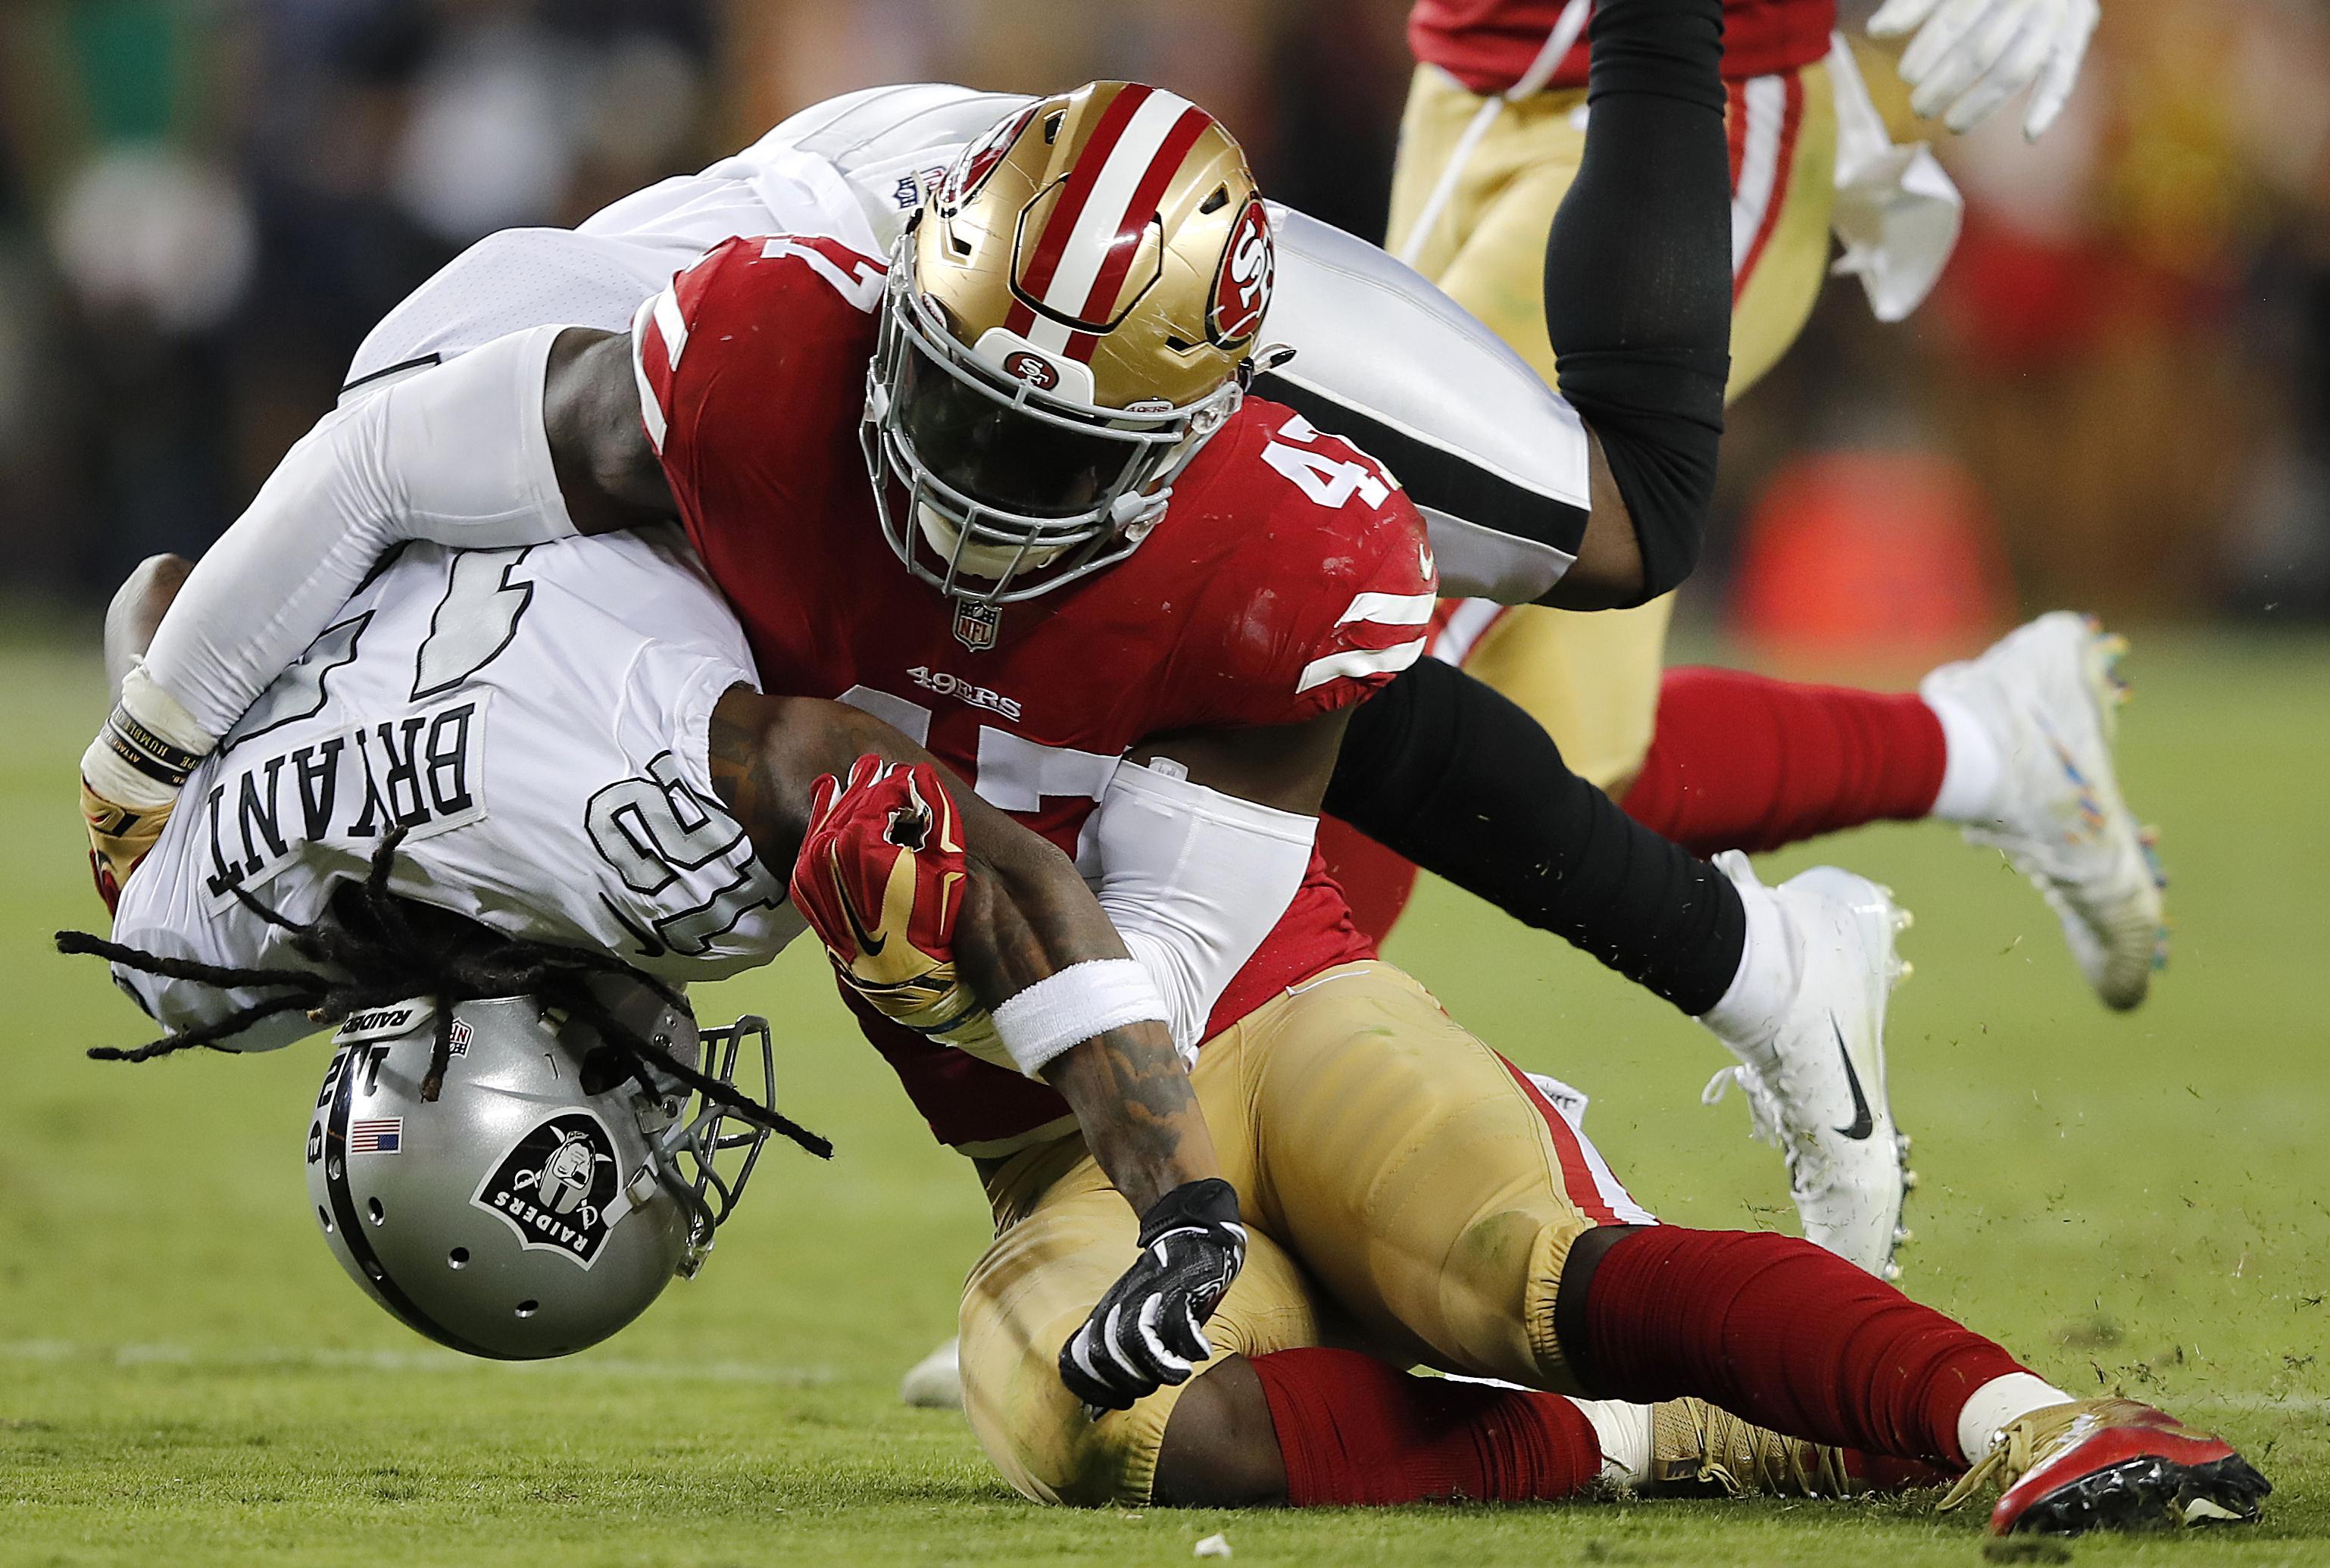 0a7d252a450 San Francisco 49ers linebacker Elijah Lee tackles Oakland Raiders wide  receiver Martavis Bryant during the second